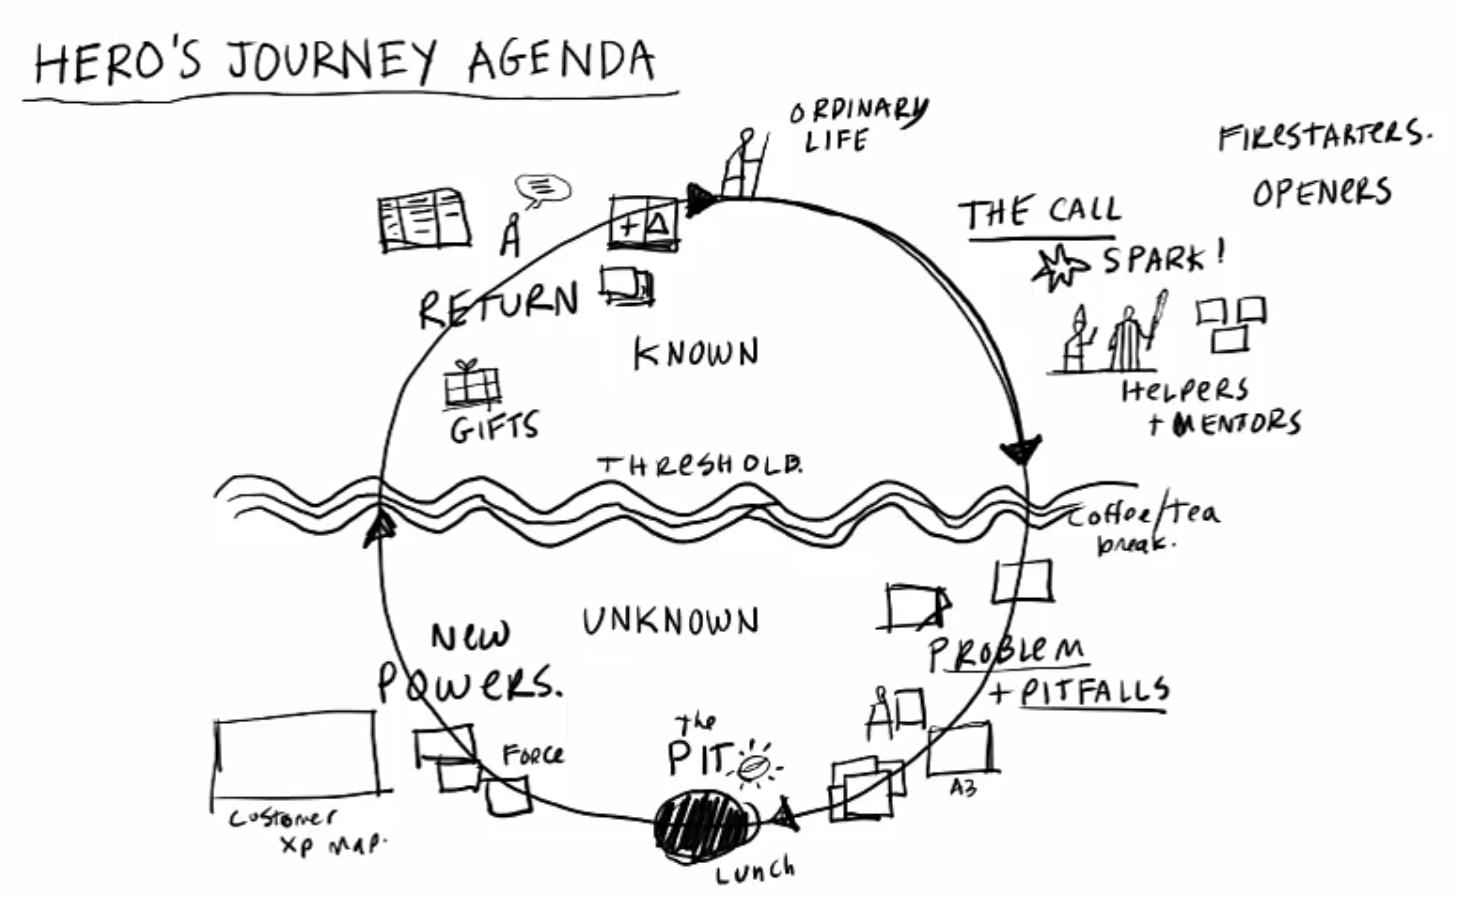 Hero S Journey Agenda